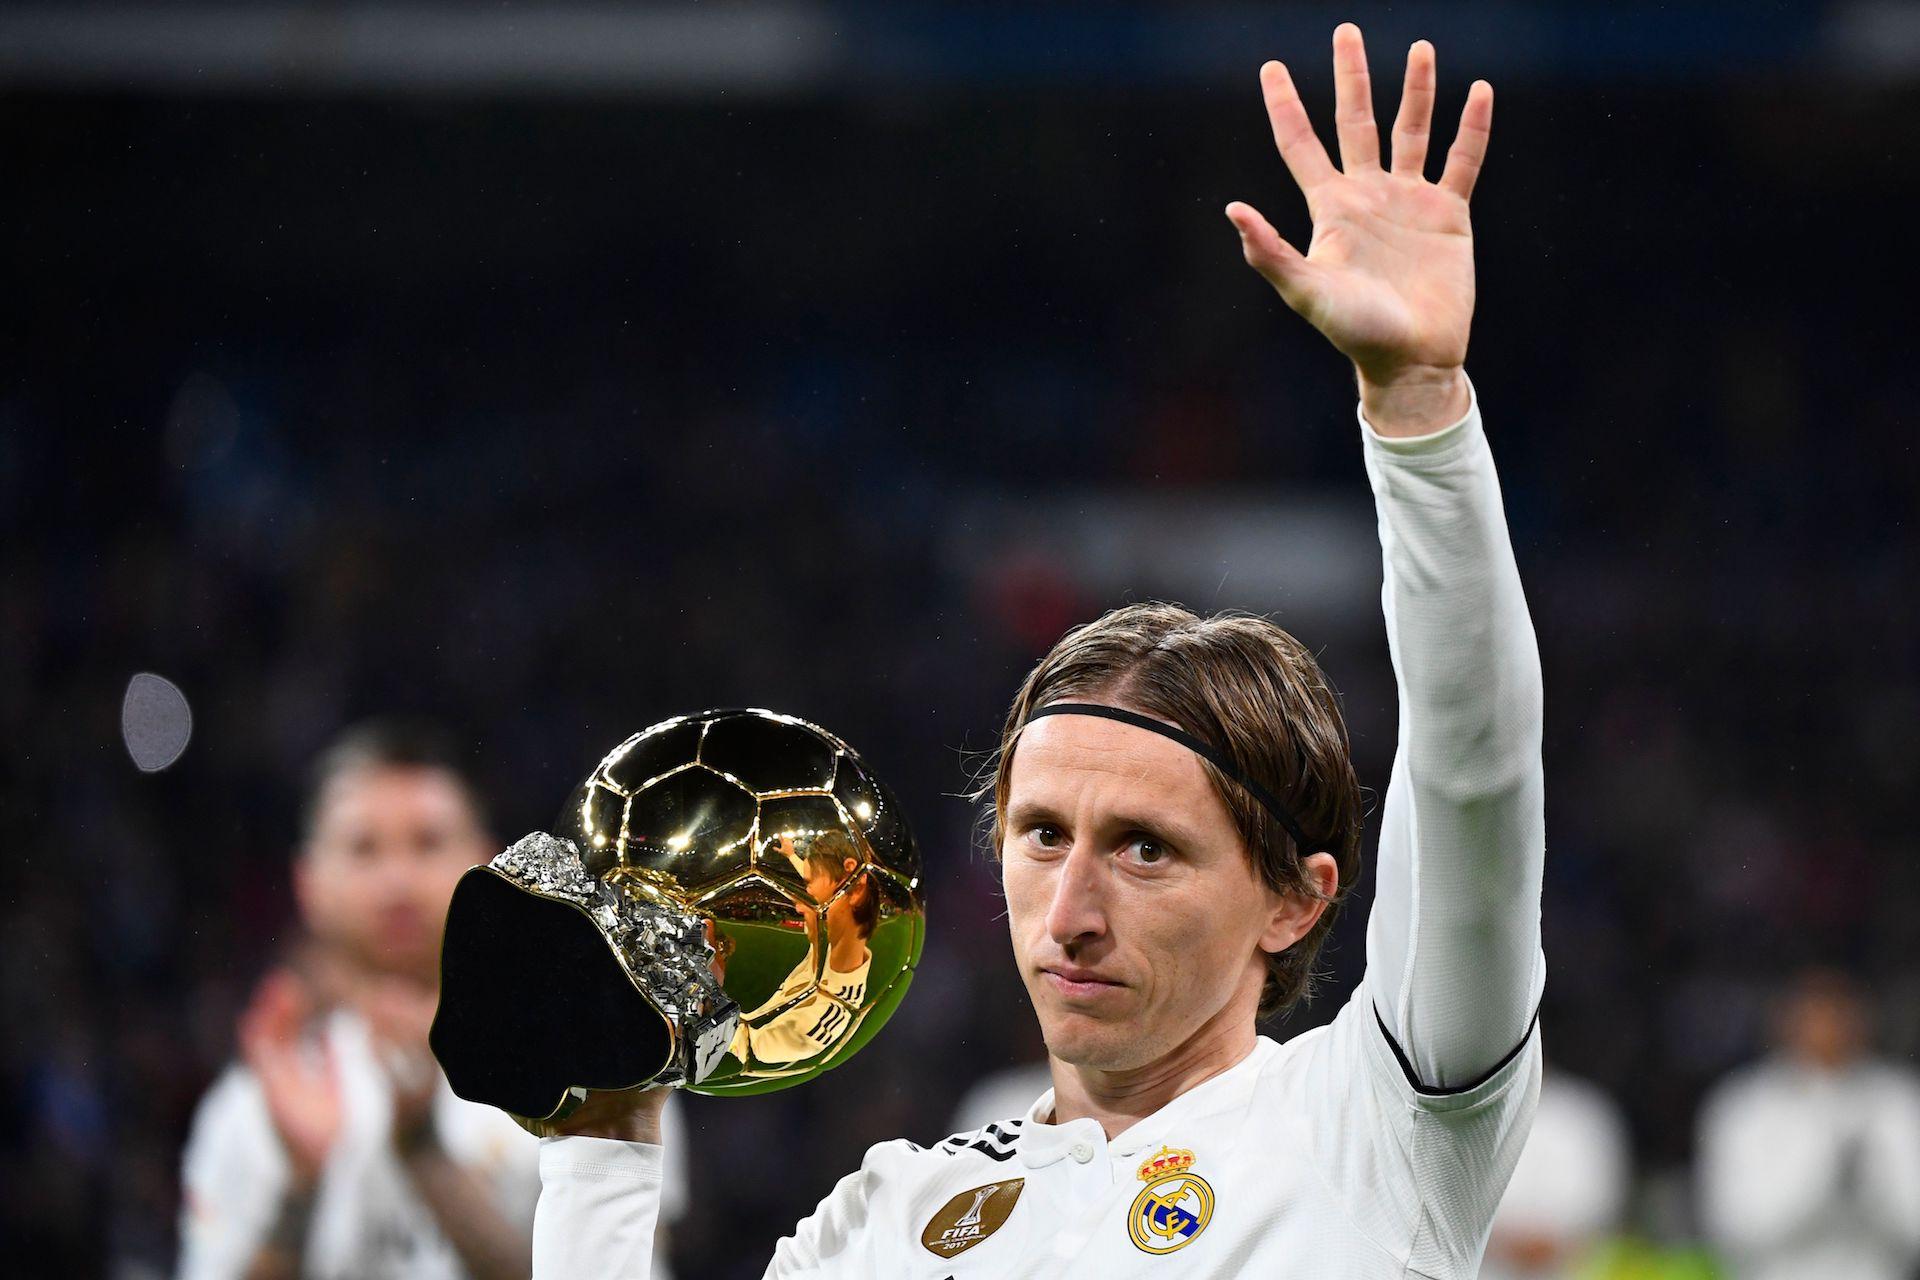 Image Result For Vivo Psg Vs Real Madrid En Vivo Streaming Video